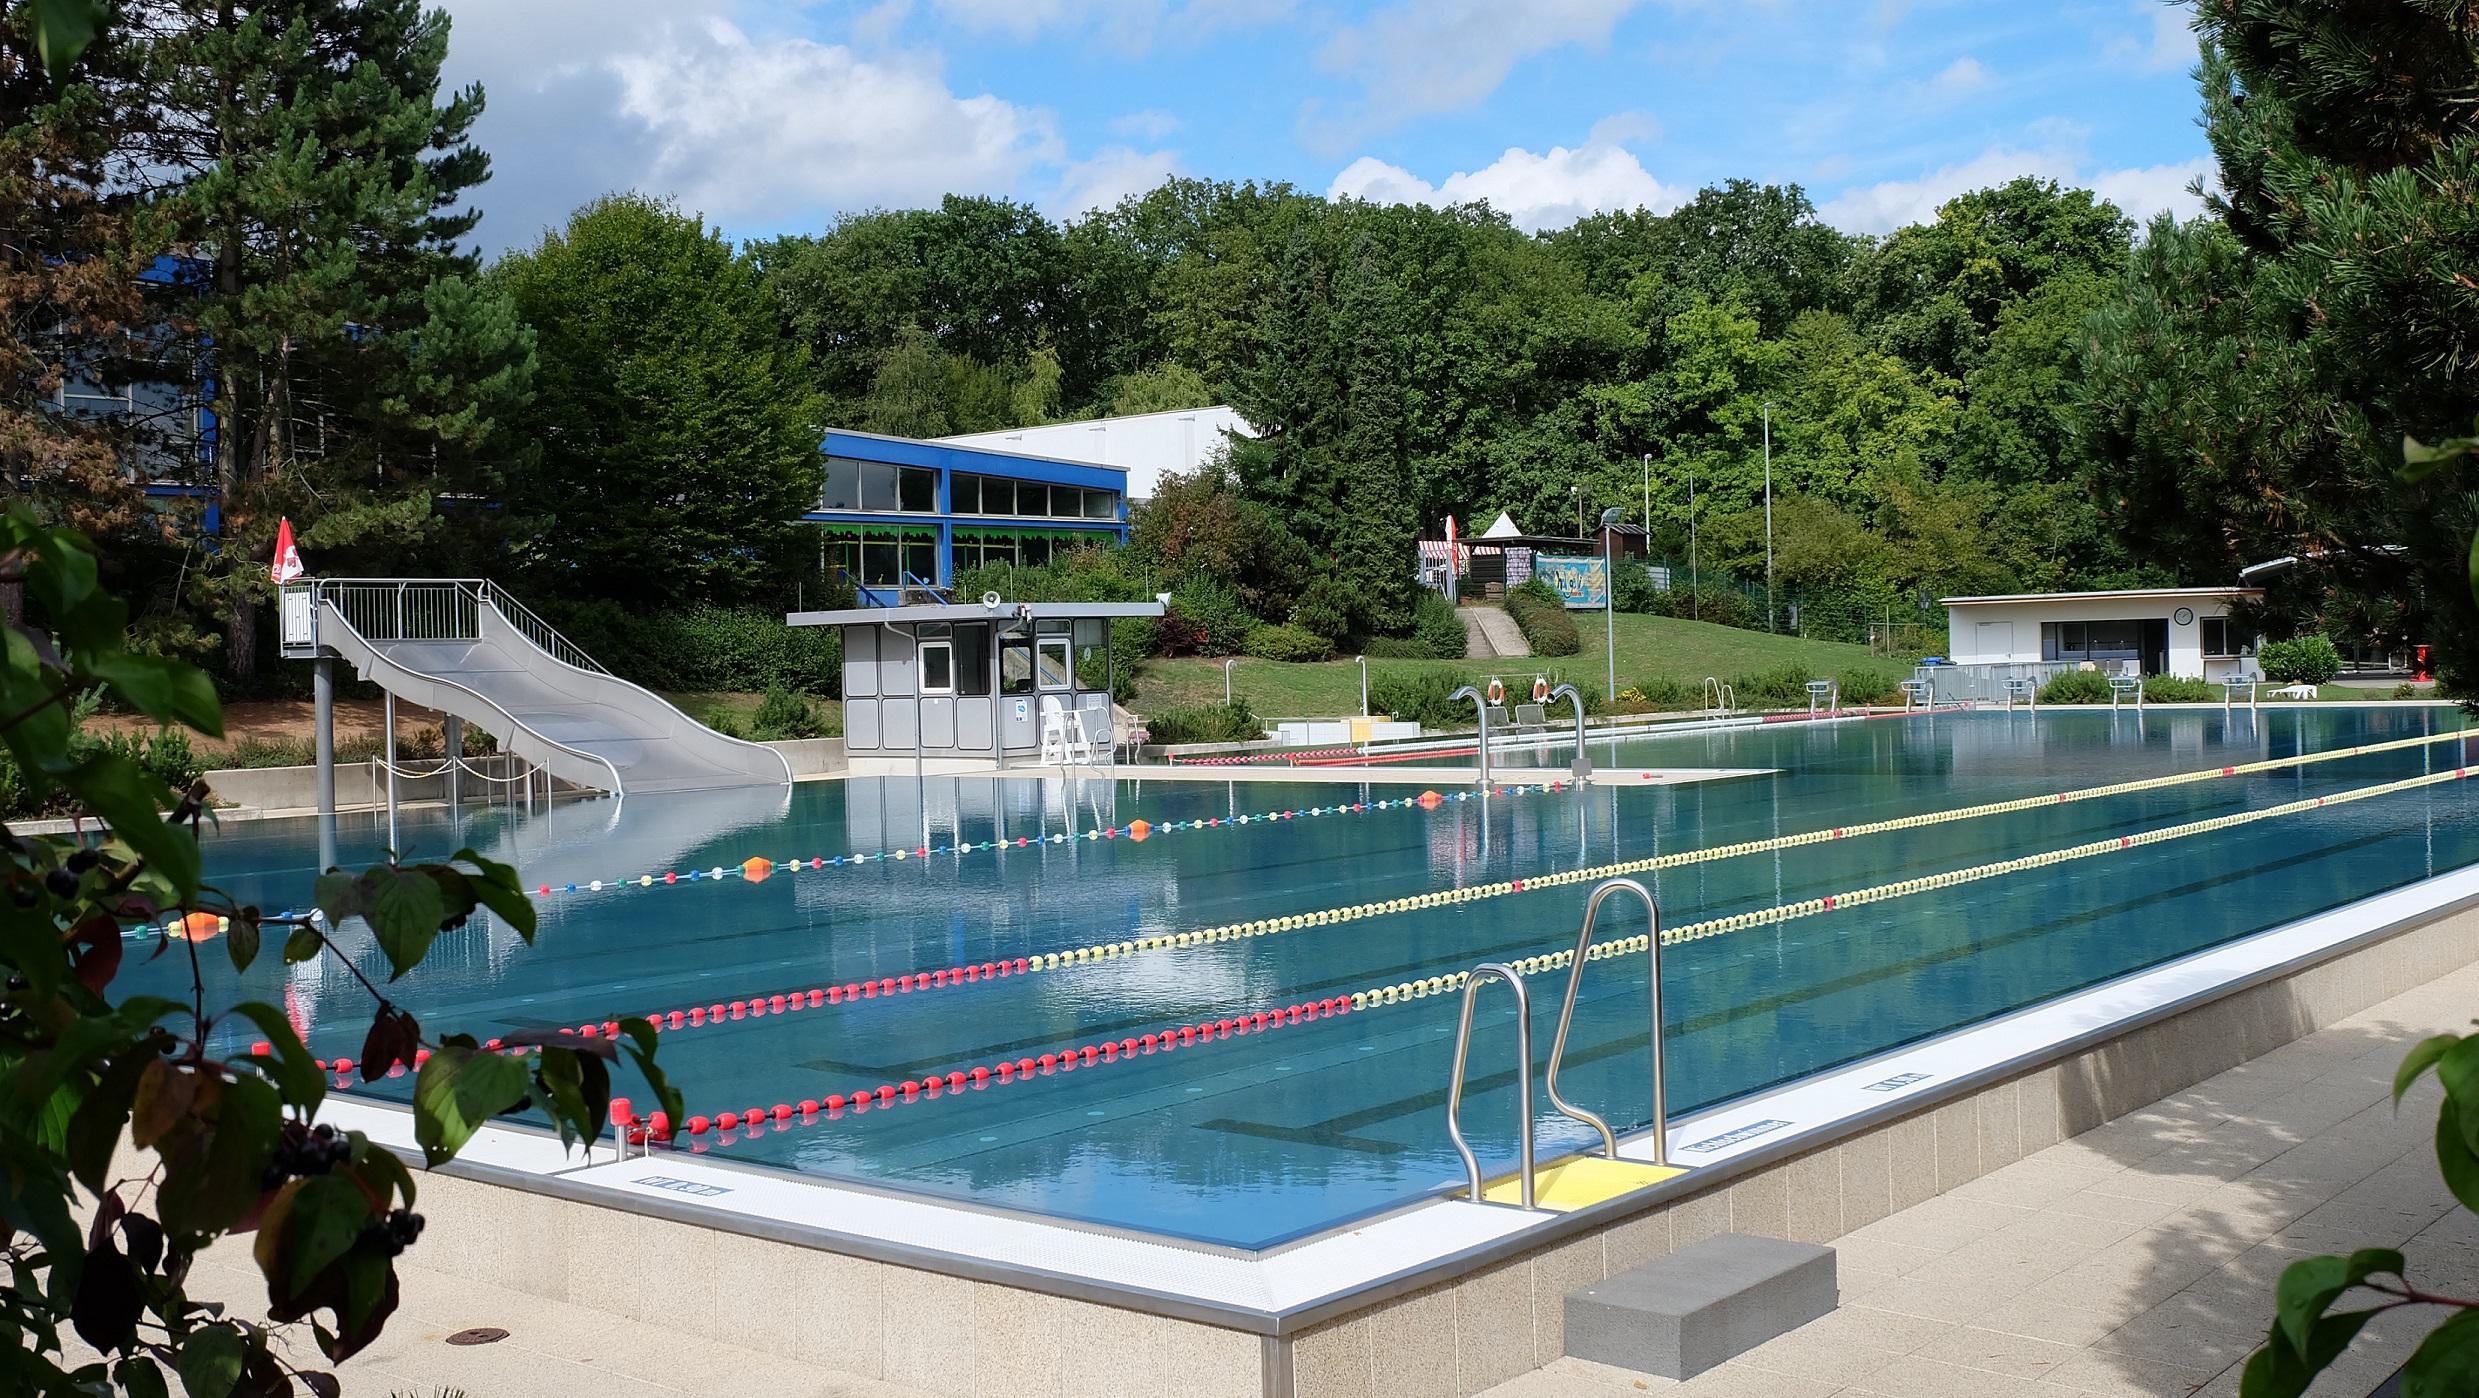 stunning indoor pool bauen traumhafte schwimmbaeder contemporary. Black Bedroom Furniture Sets. Home Design Ideas